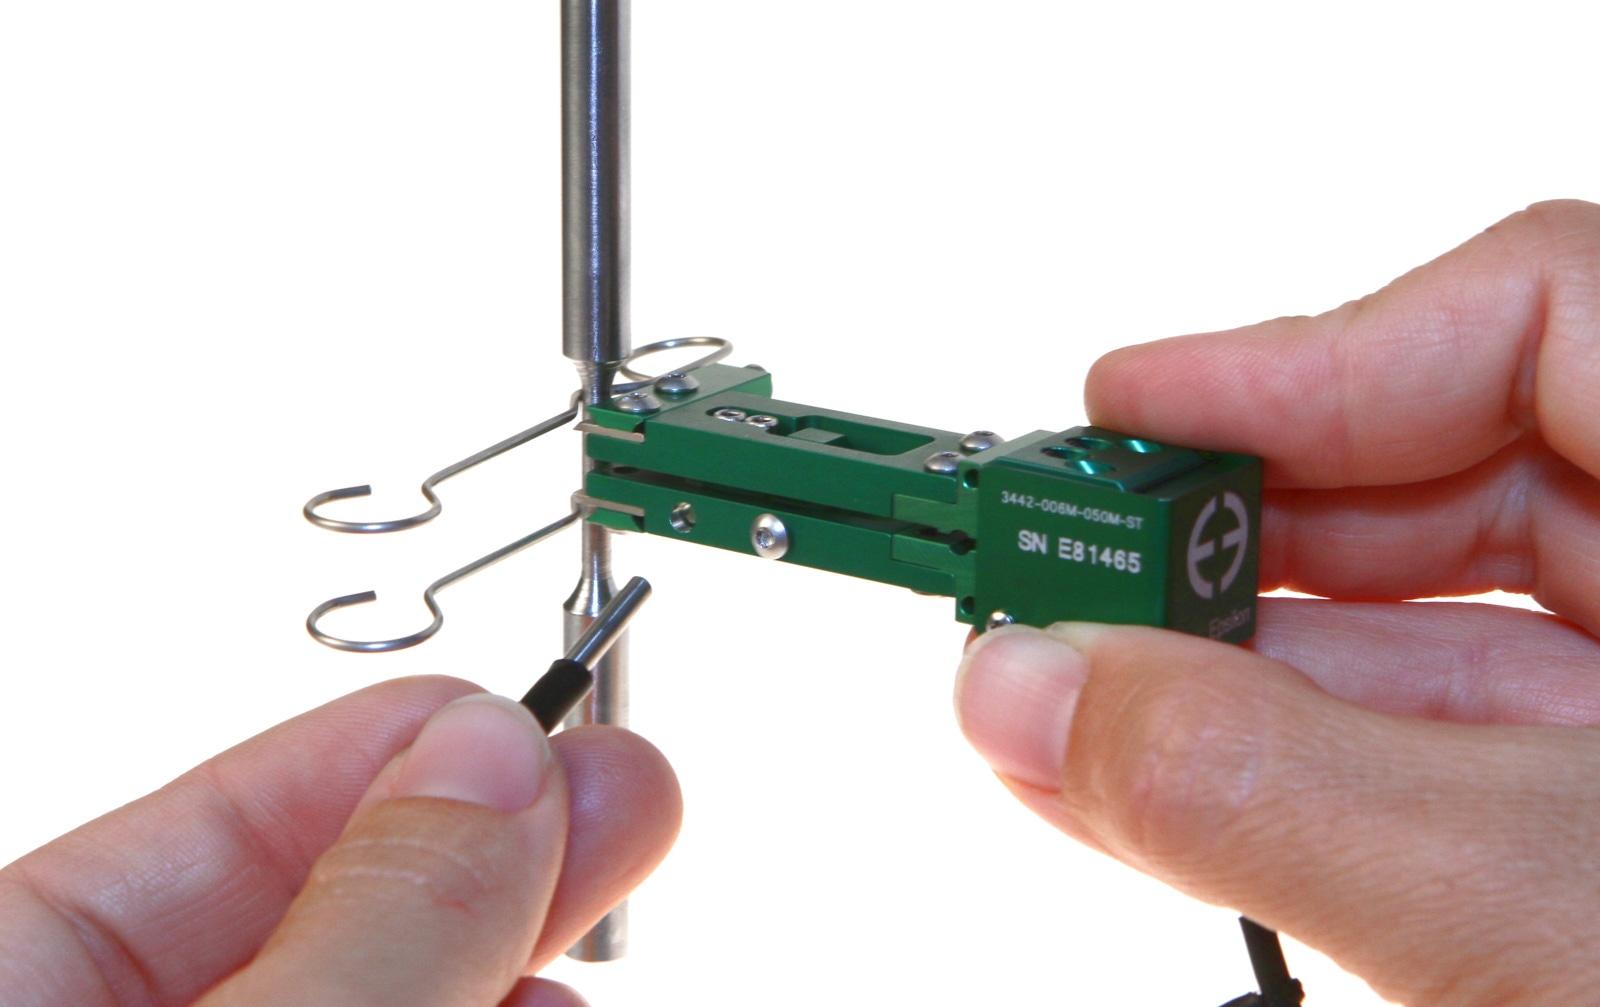 Epsilon MODEL 3442 Miniature Extensometers